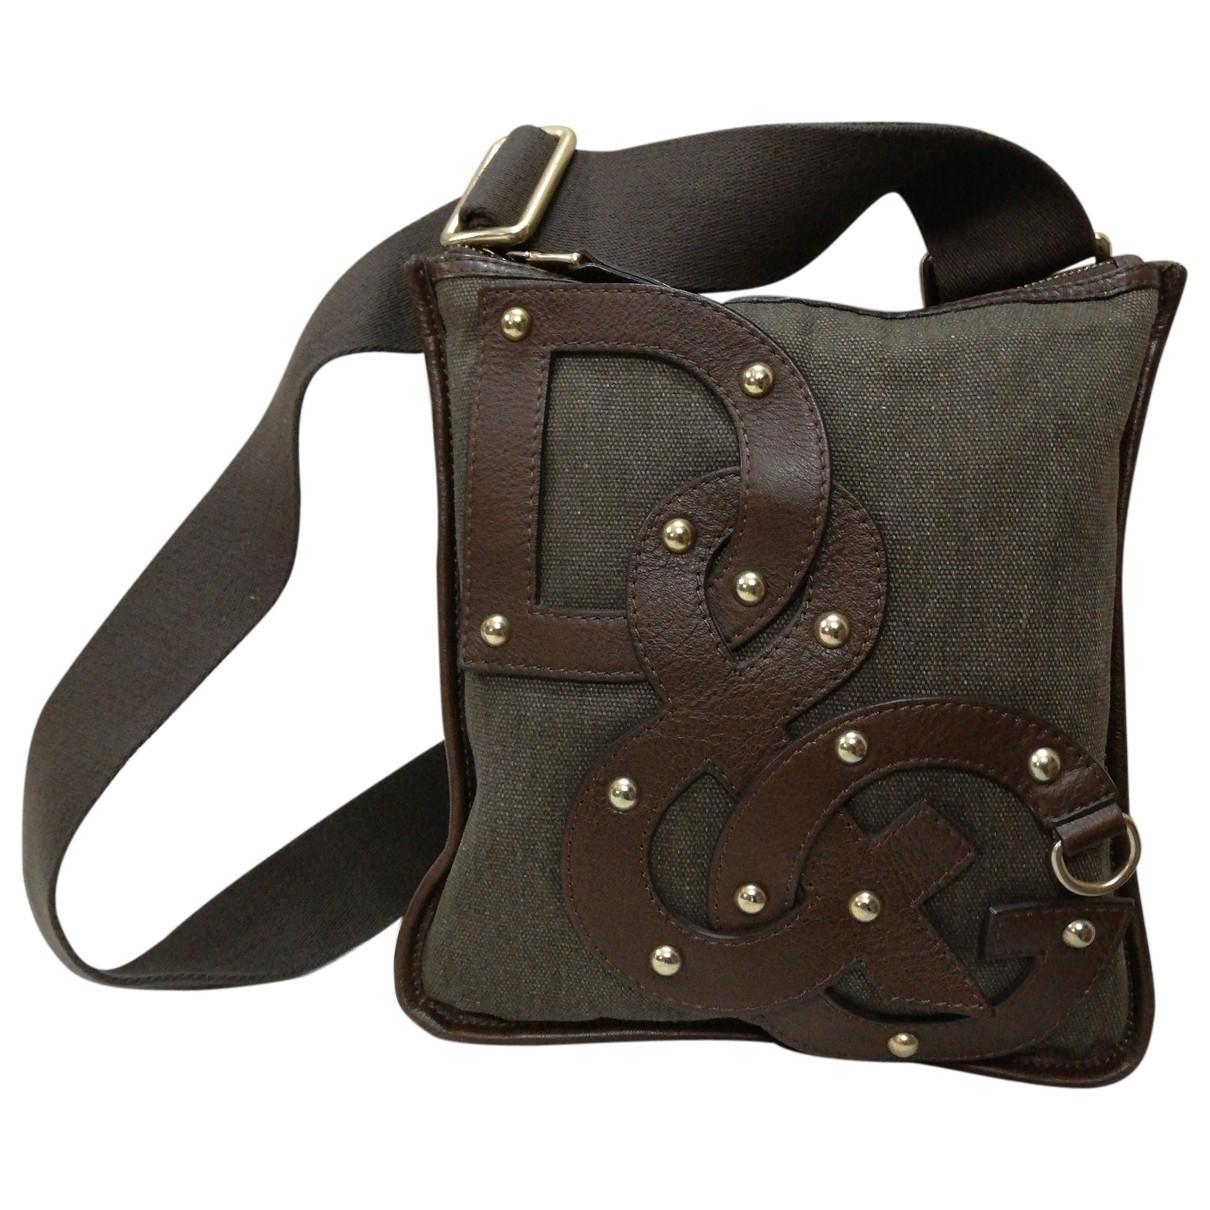 D&g \N Brown Cloth handbag for Women \N